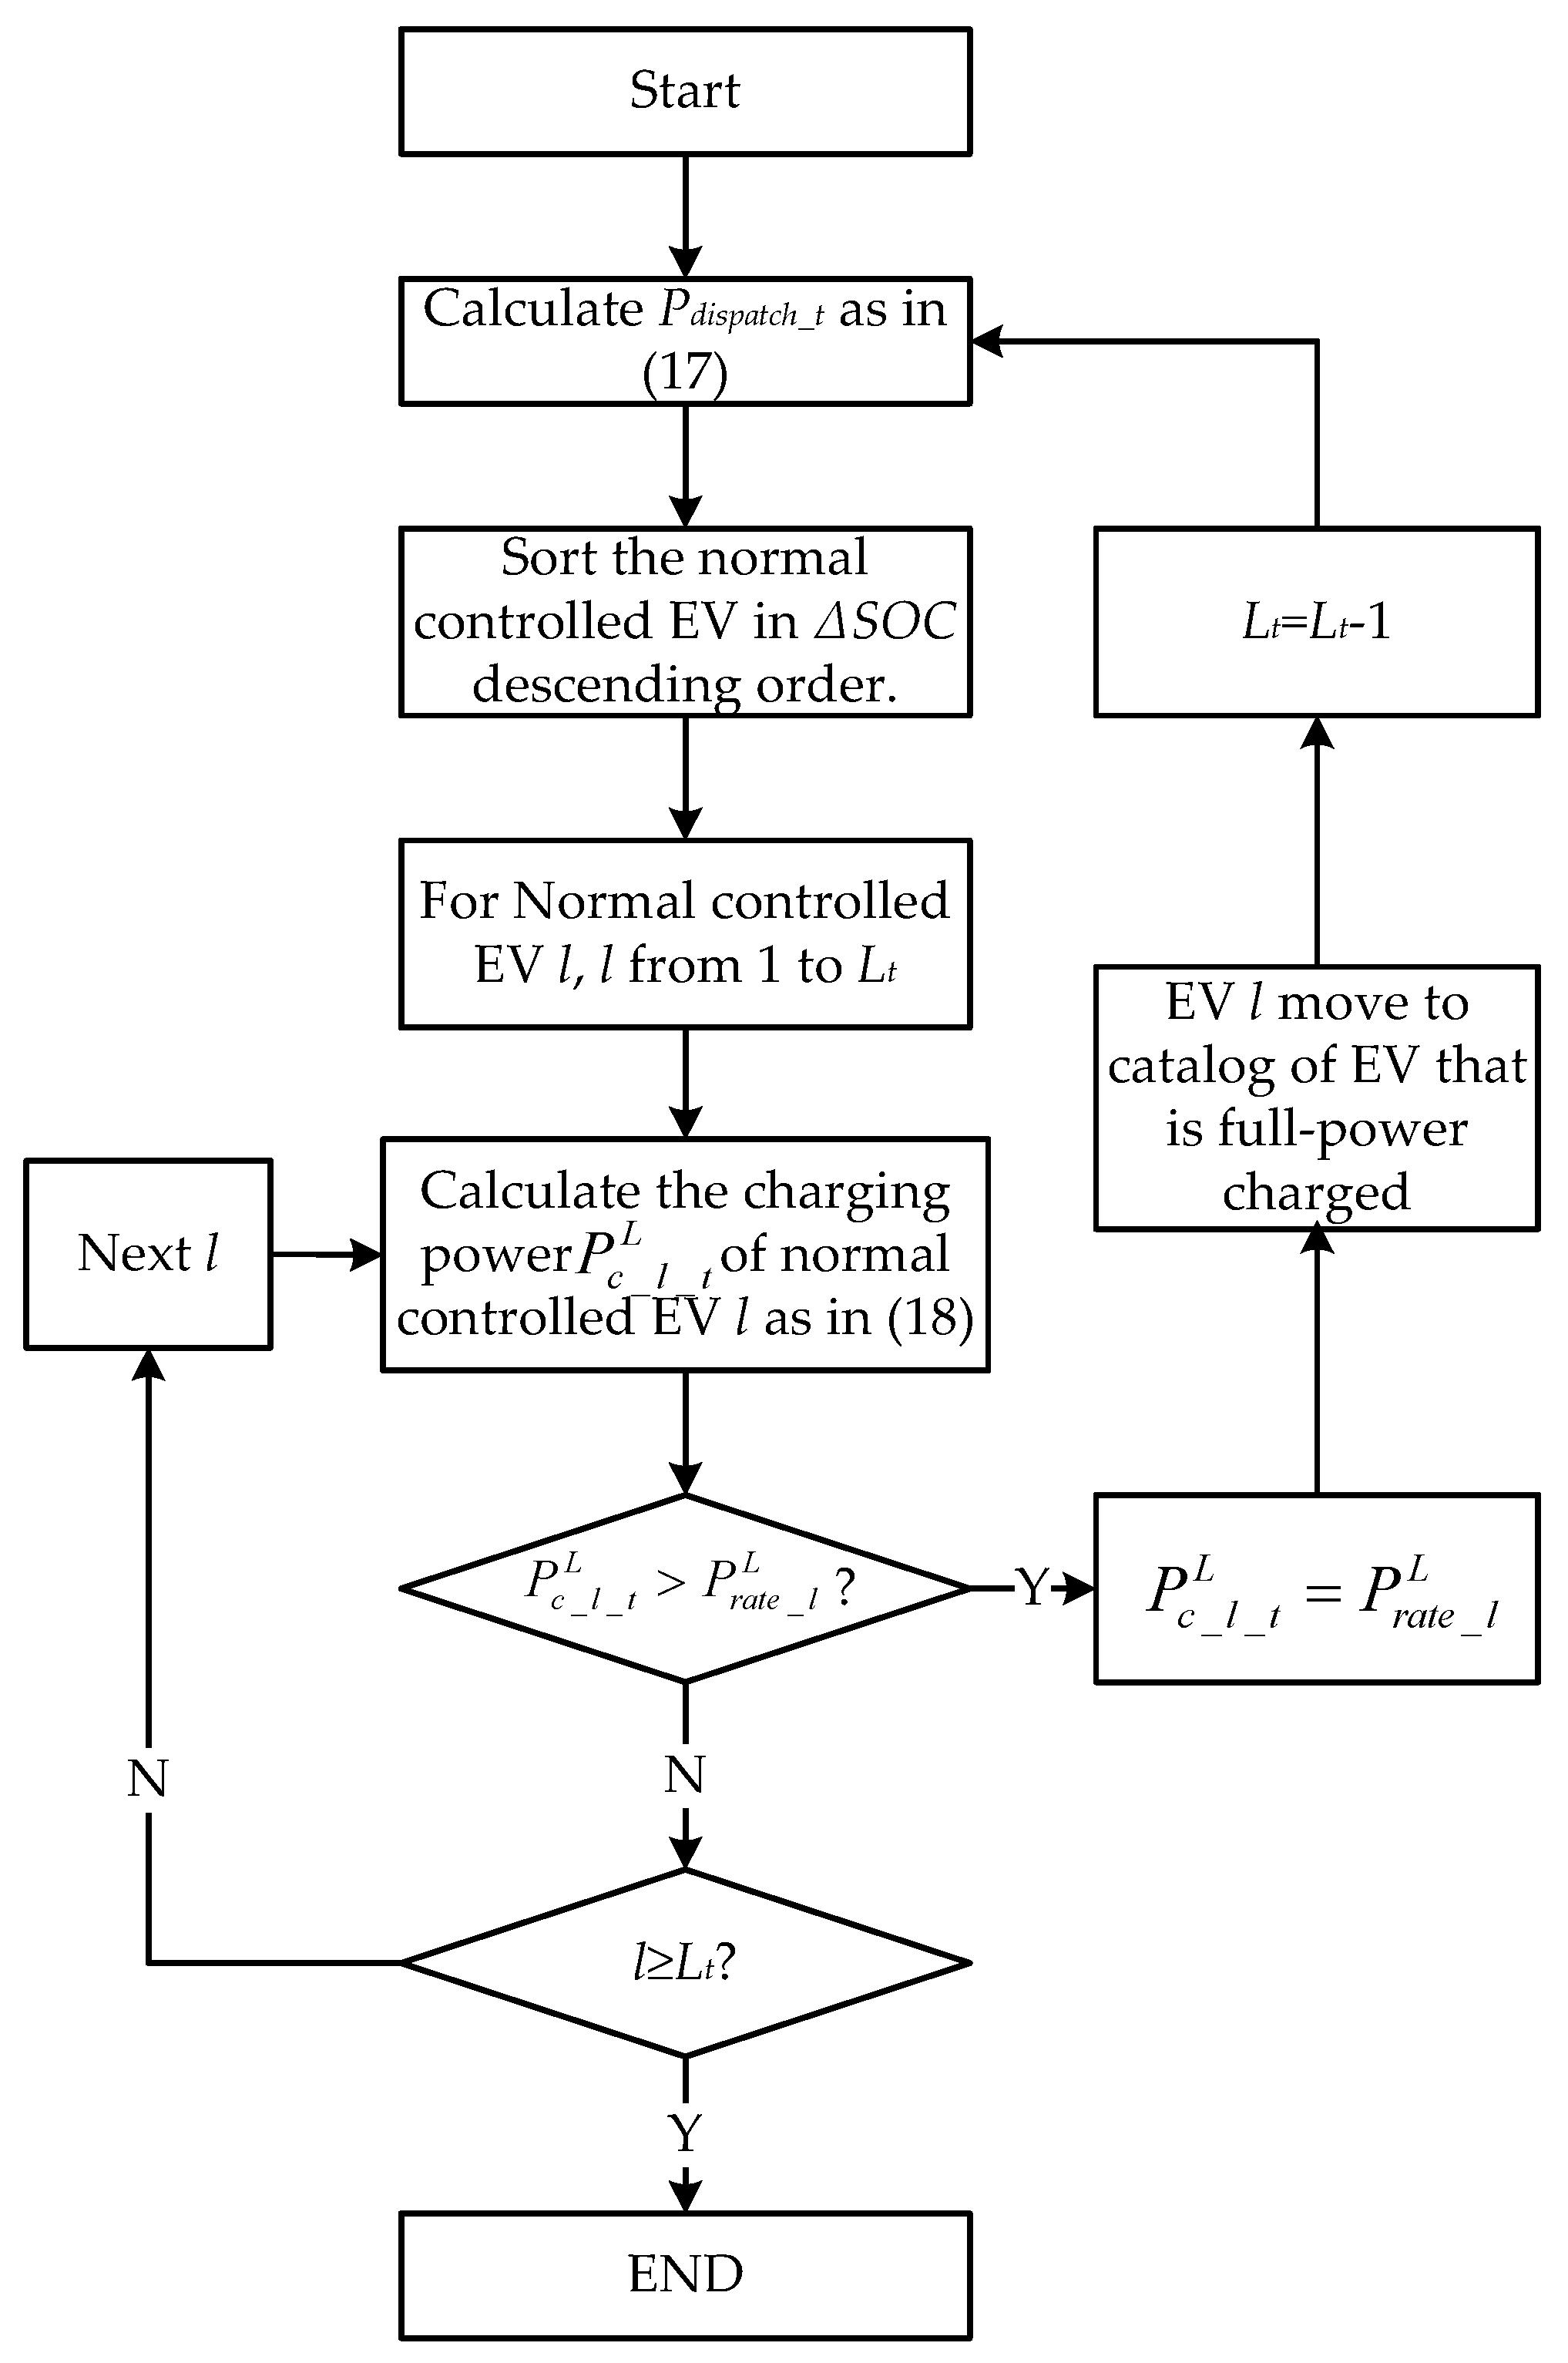 energies-09-00159-g002  M Real Wiring Diagram on 5.3 engine diagram, 5.3 fuel system diagram, 5.3 firing order diagram, 5.3 motor diagram, 5.3 coolant diagram,